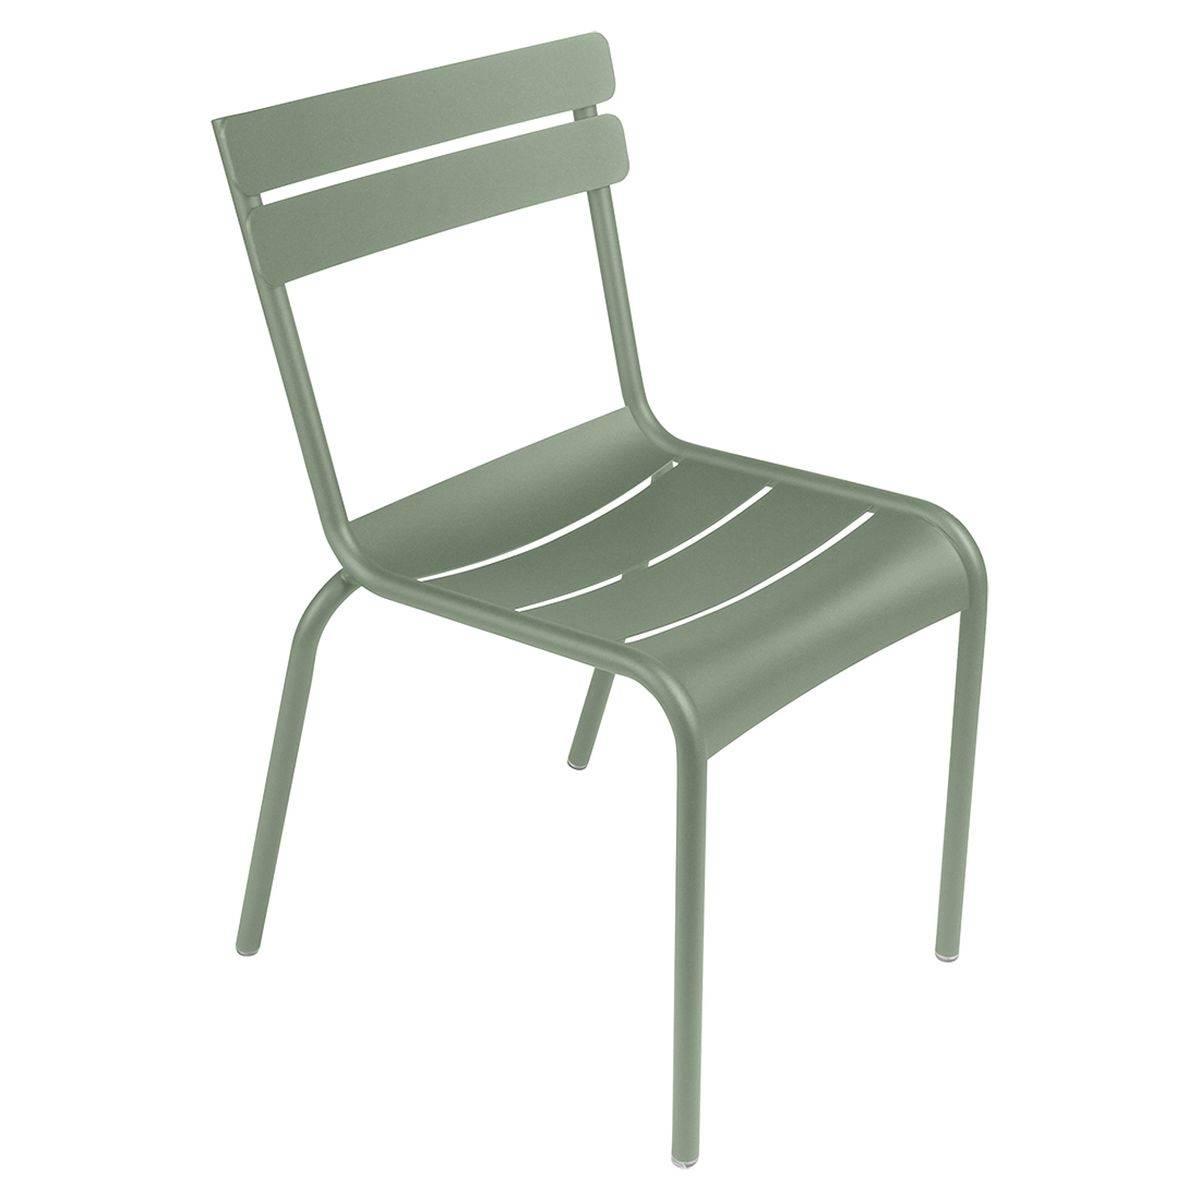 Fermob Luxembourg Chair Outdoor Furniture Jardin Nz